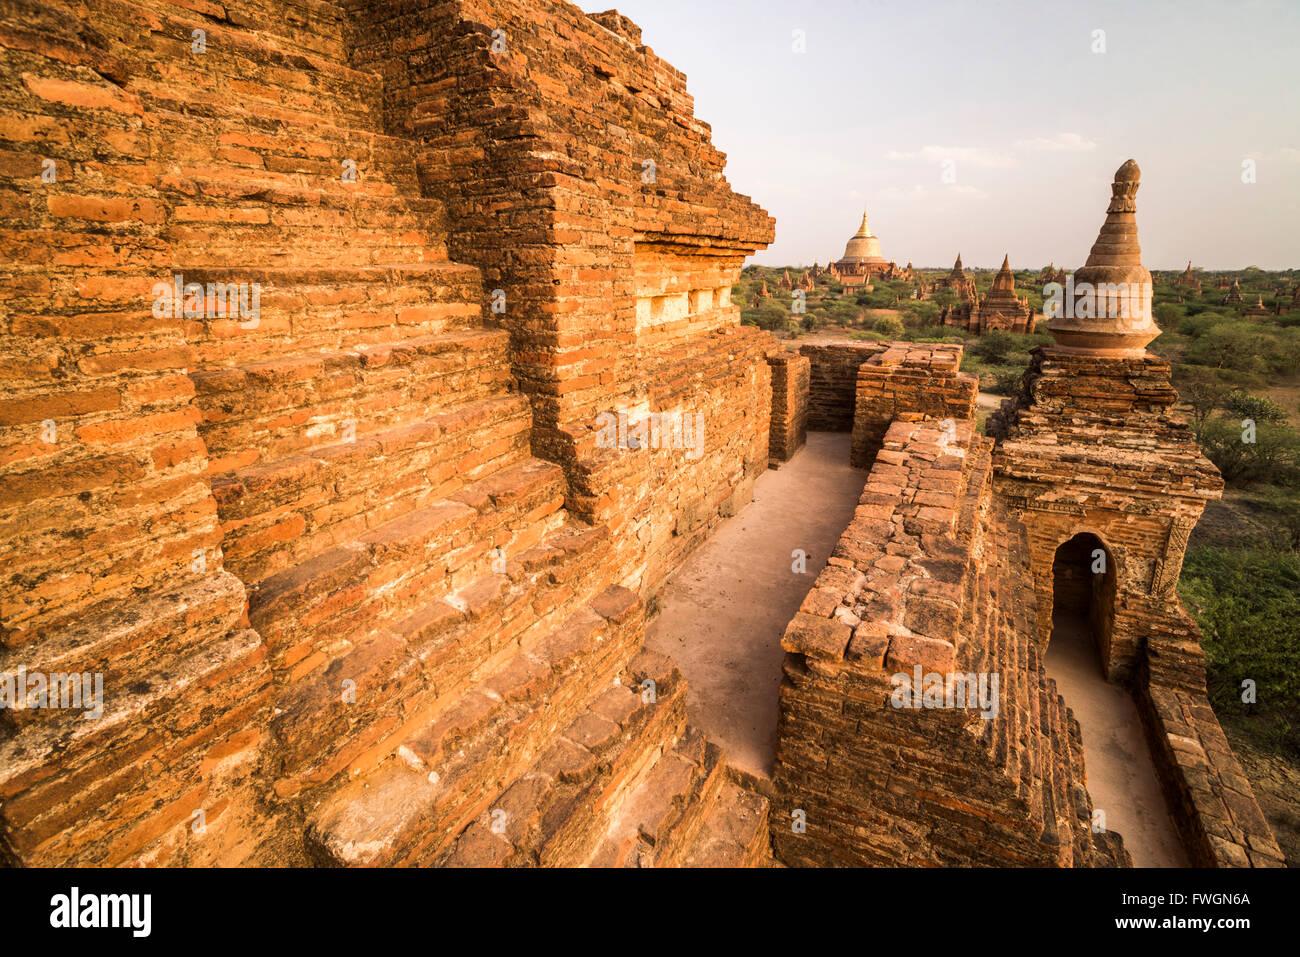 Temples of Bagan (Pagan), Myanmar (Burma), Asia - Stock Image